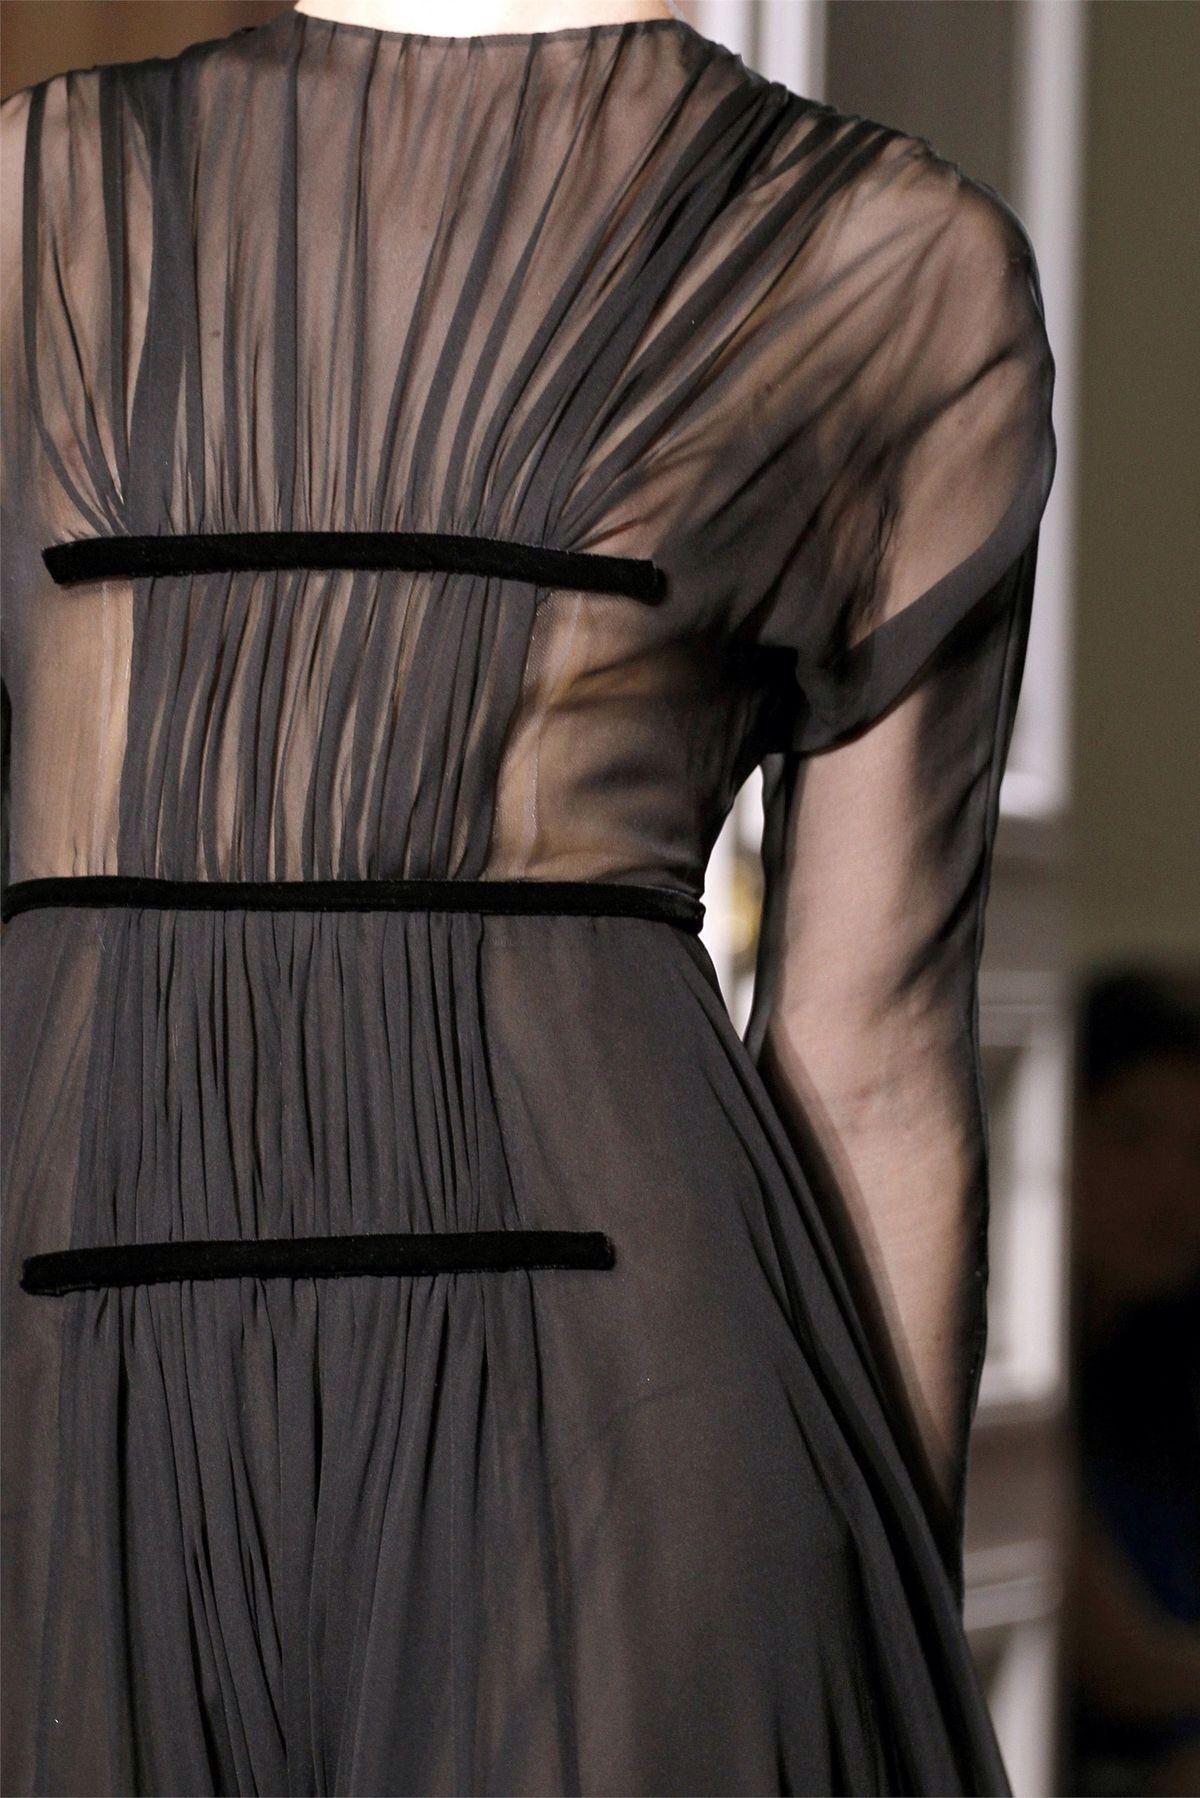 Gathering Couture Details Couture Fashion Fashion Details